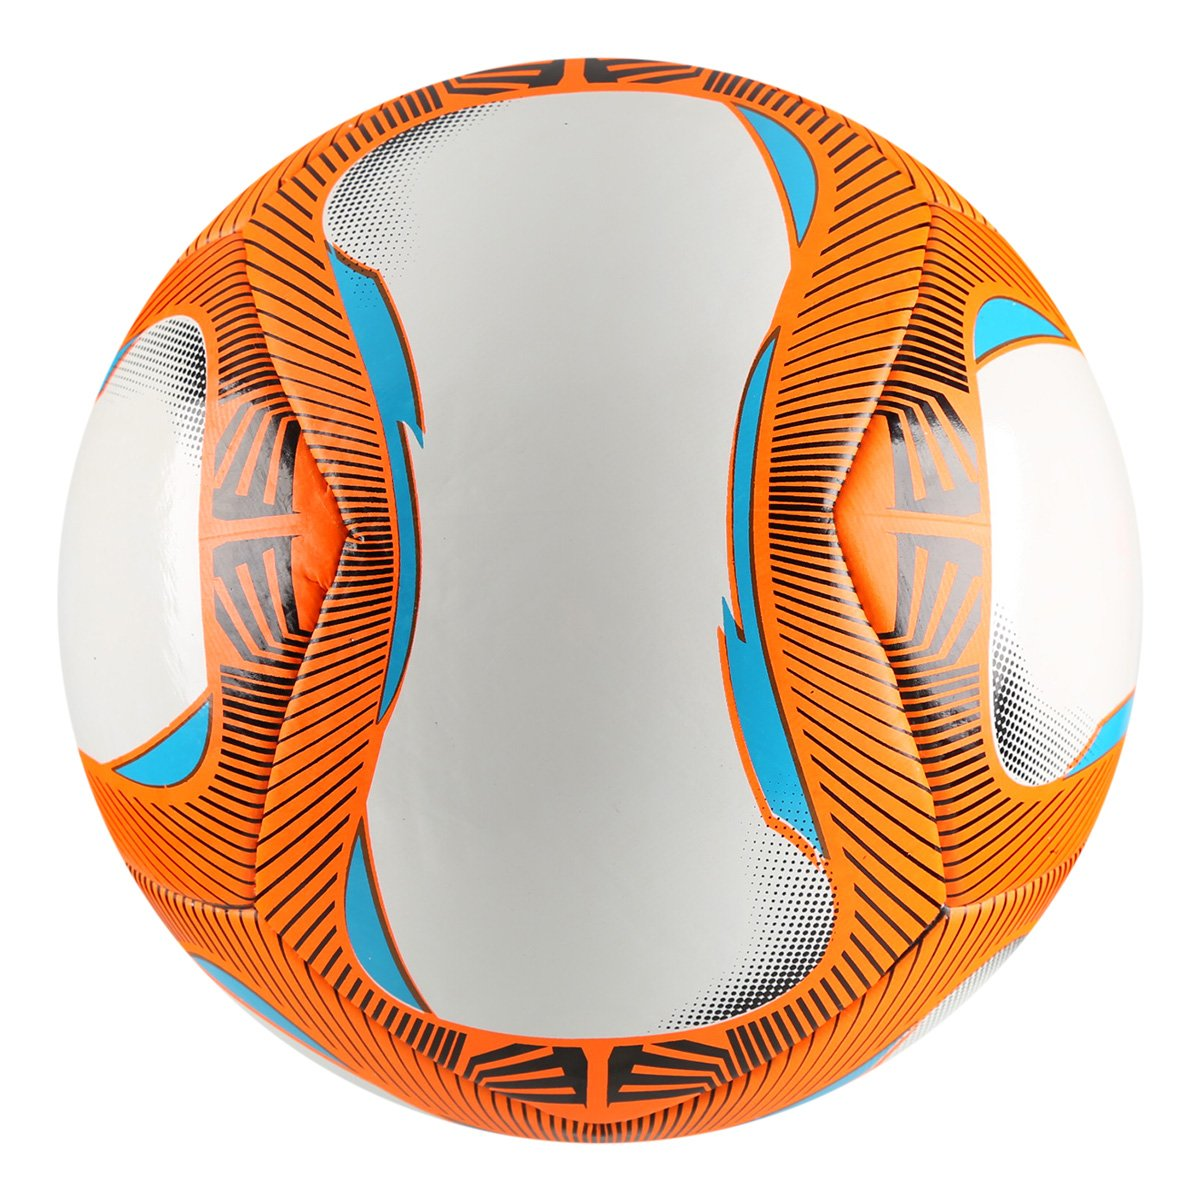 Bola Futebol Campo Topper Drible - Branco e Laranja - Compre Agora ... 1a583e70befba